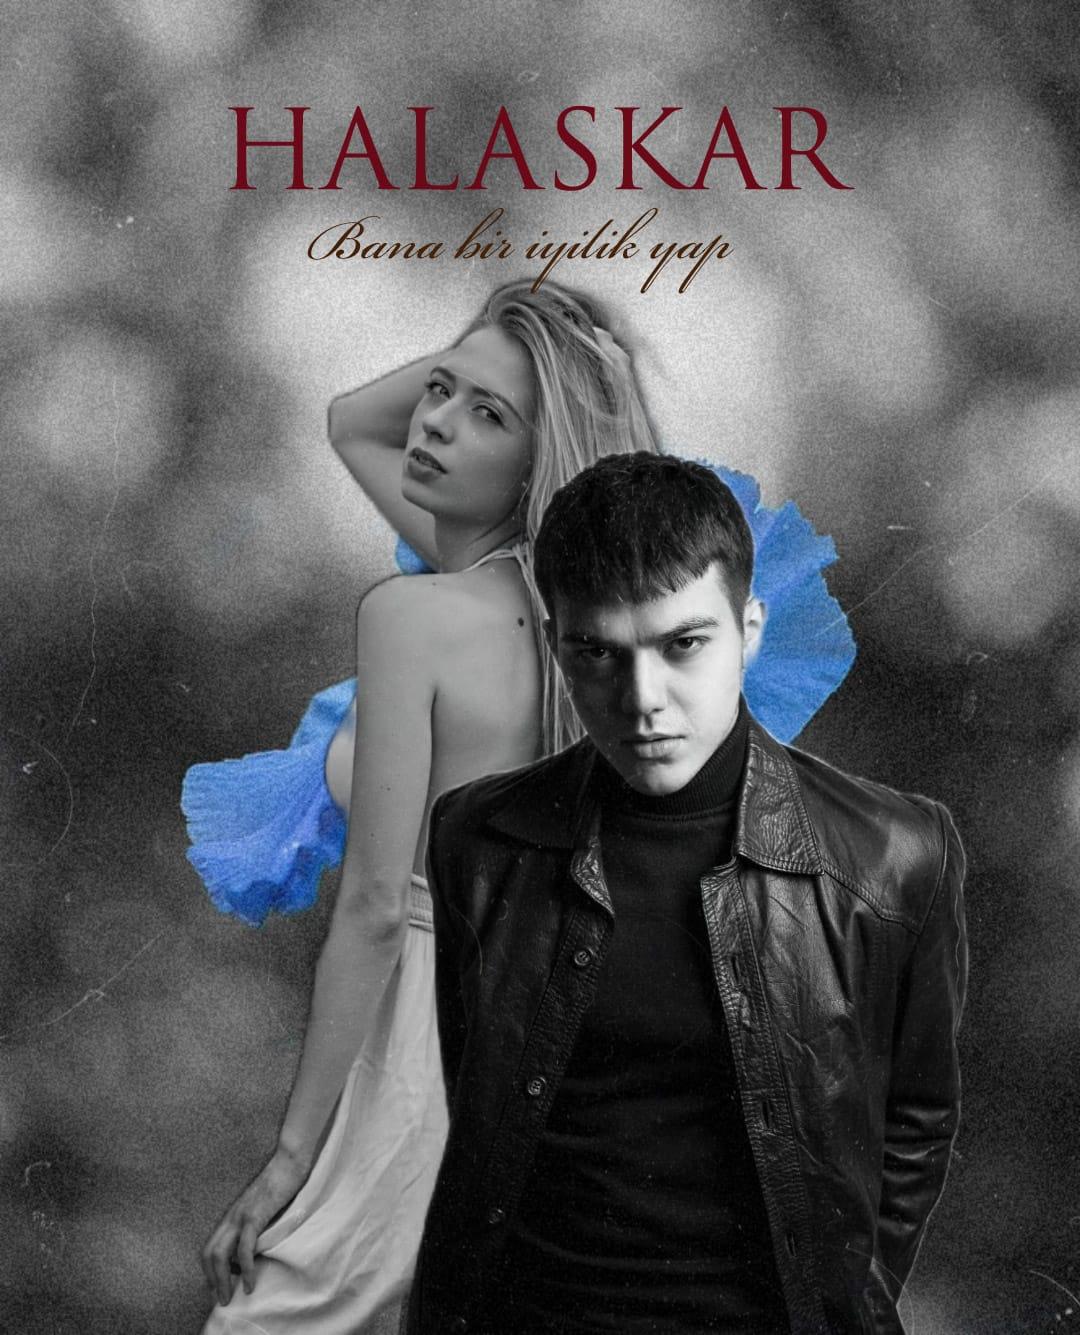 Halaskar